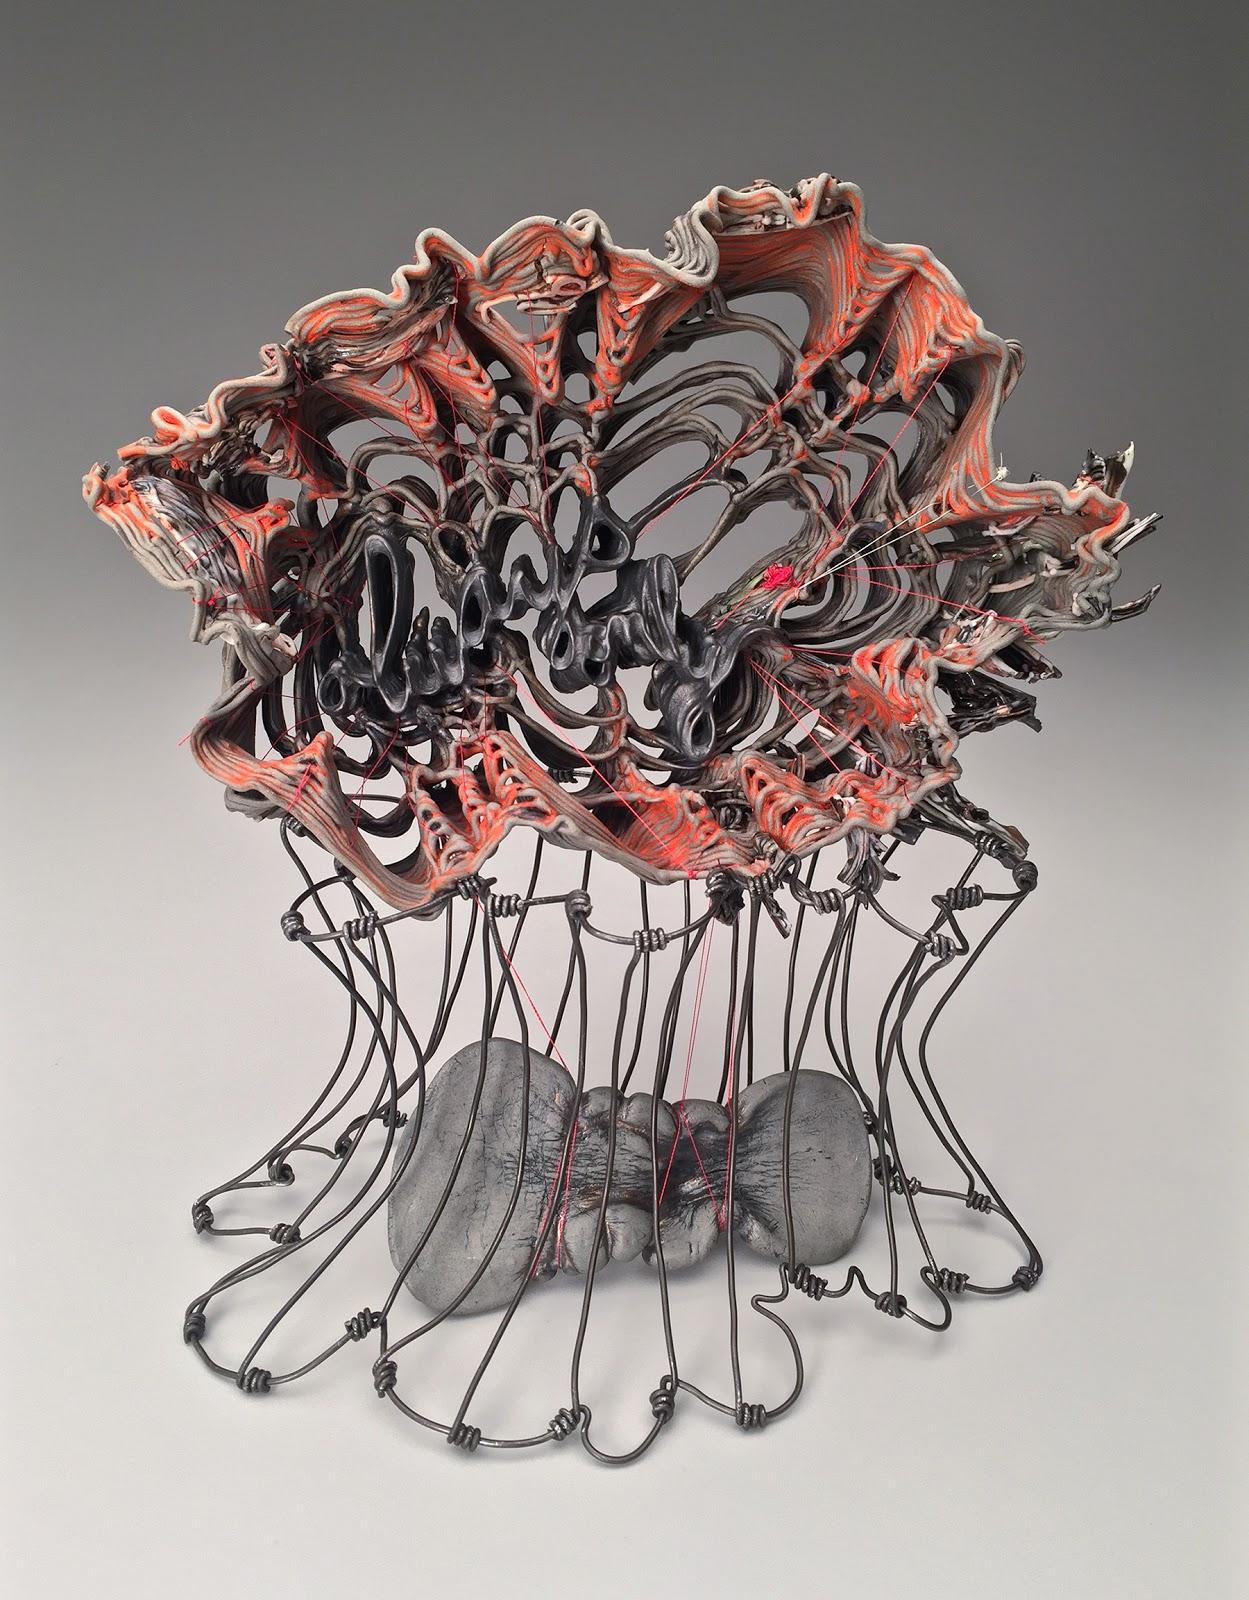 Stephanie Lanter Always On (2017) Porcelain, glaze, thread, and wire, 11 x 12 x 5 in., courtesy of artist